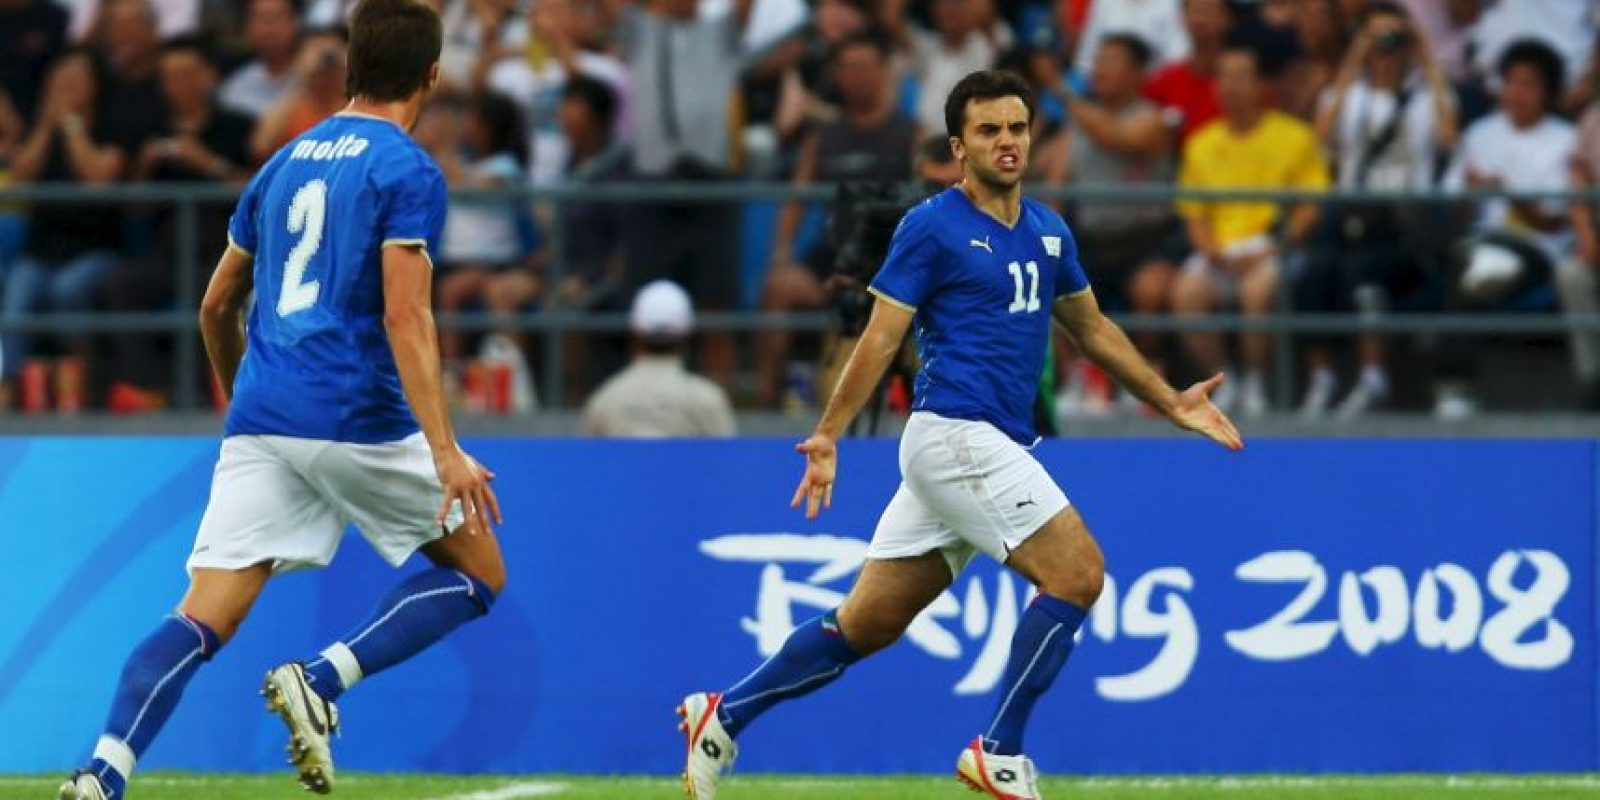 Beijing 2008: Giuseppe Rossi (Italia) – 4 goles, 4 partidos Foto:Getty Images